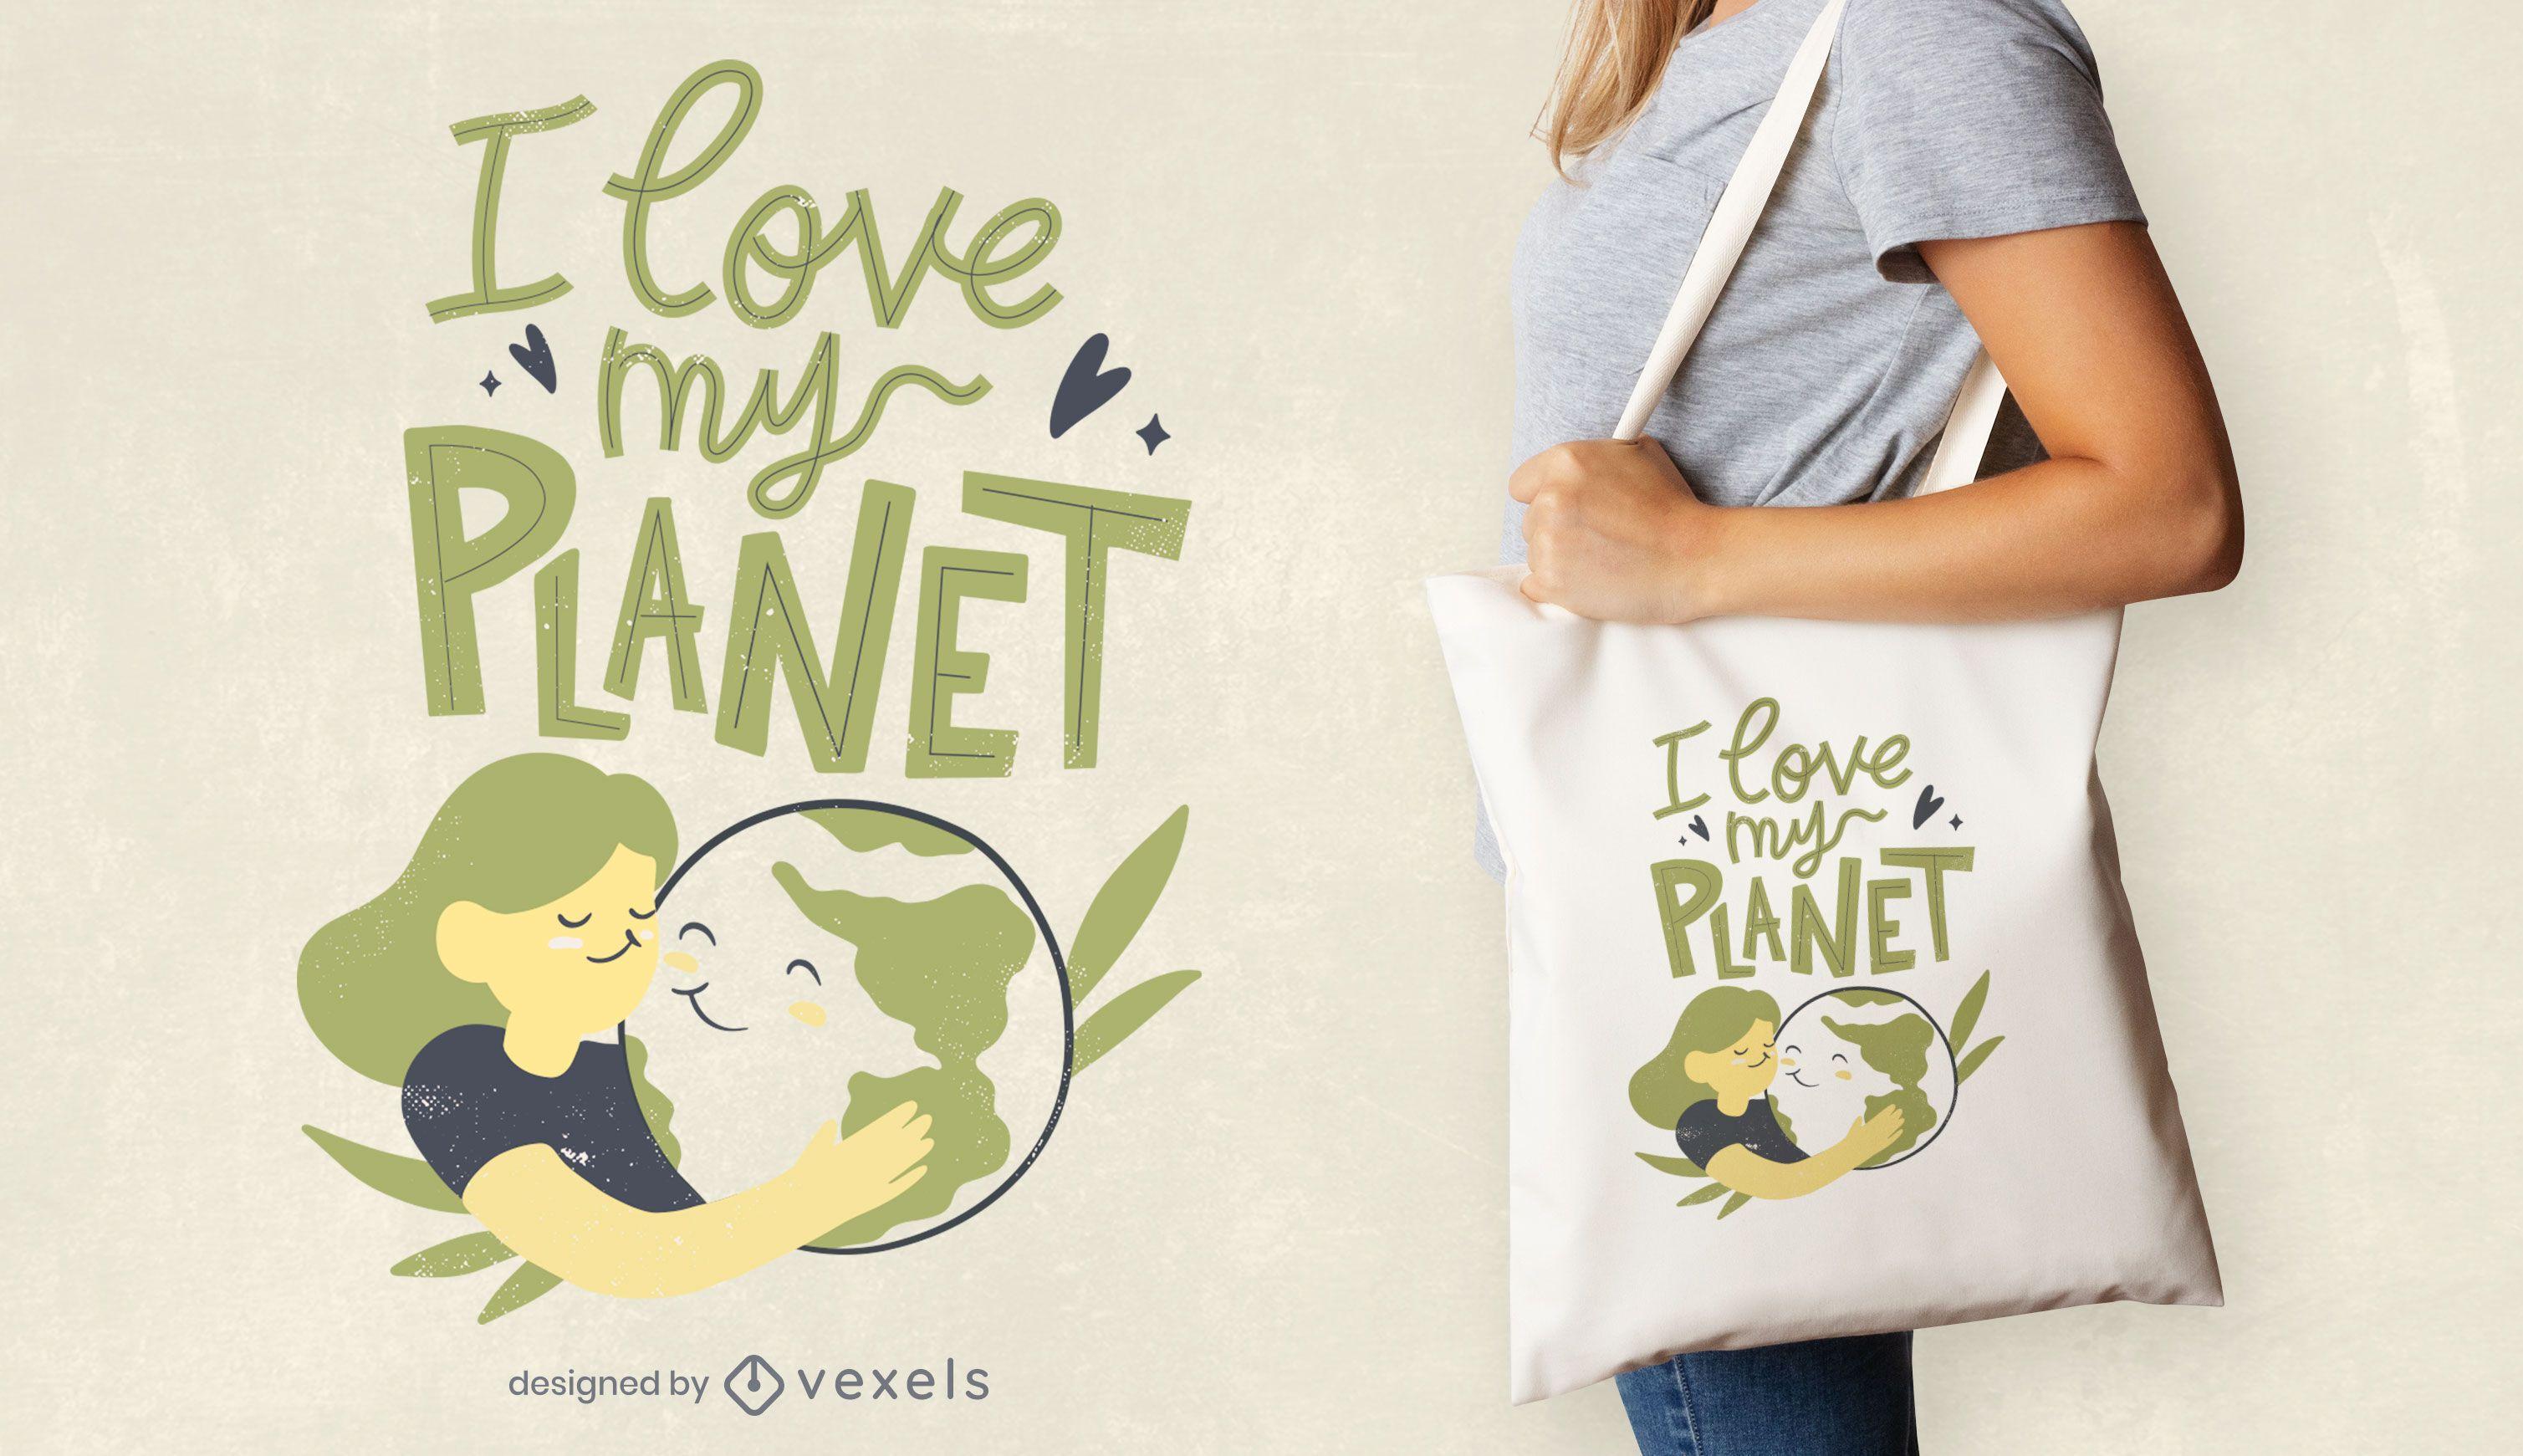 Love my planet tote bag design